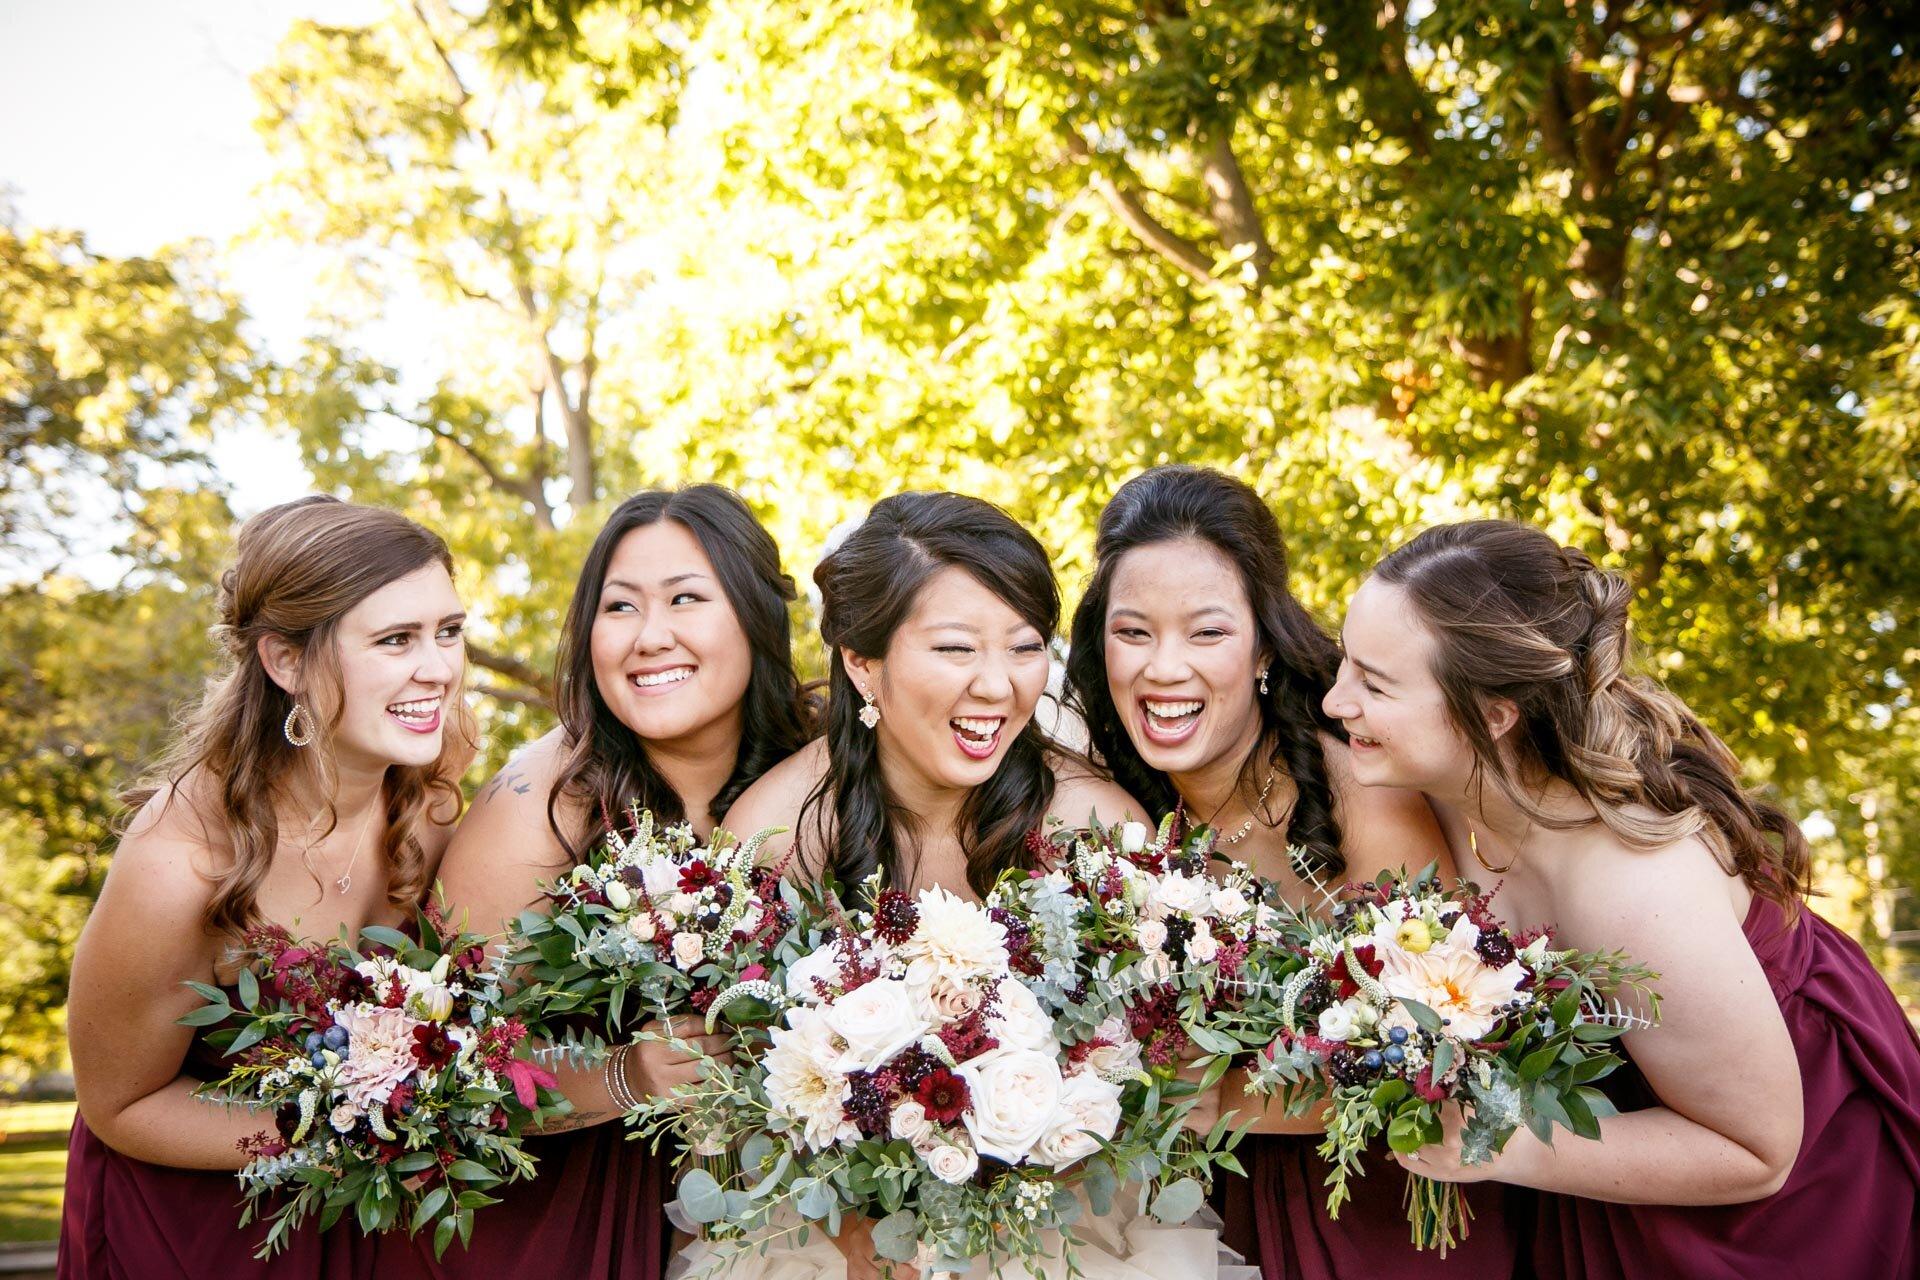 adam-shea-photography-fall-autumn-lighting-engagement-wedding-photos-adam-shea-photography-green-bay-appleton-neenah-photographer-14.jpg